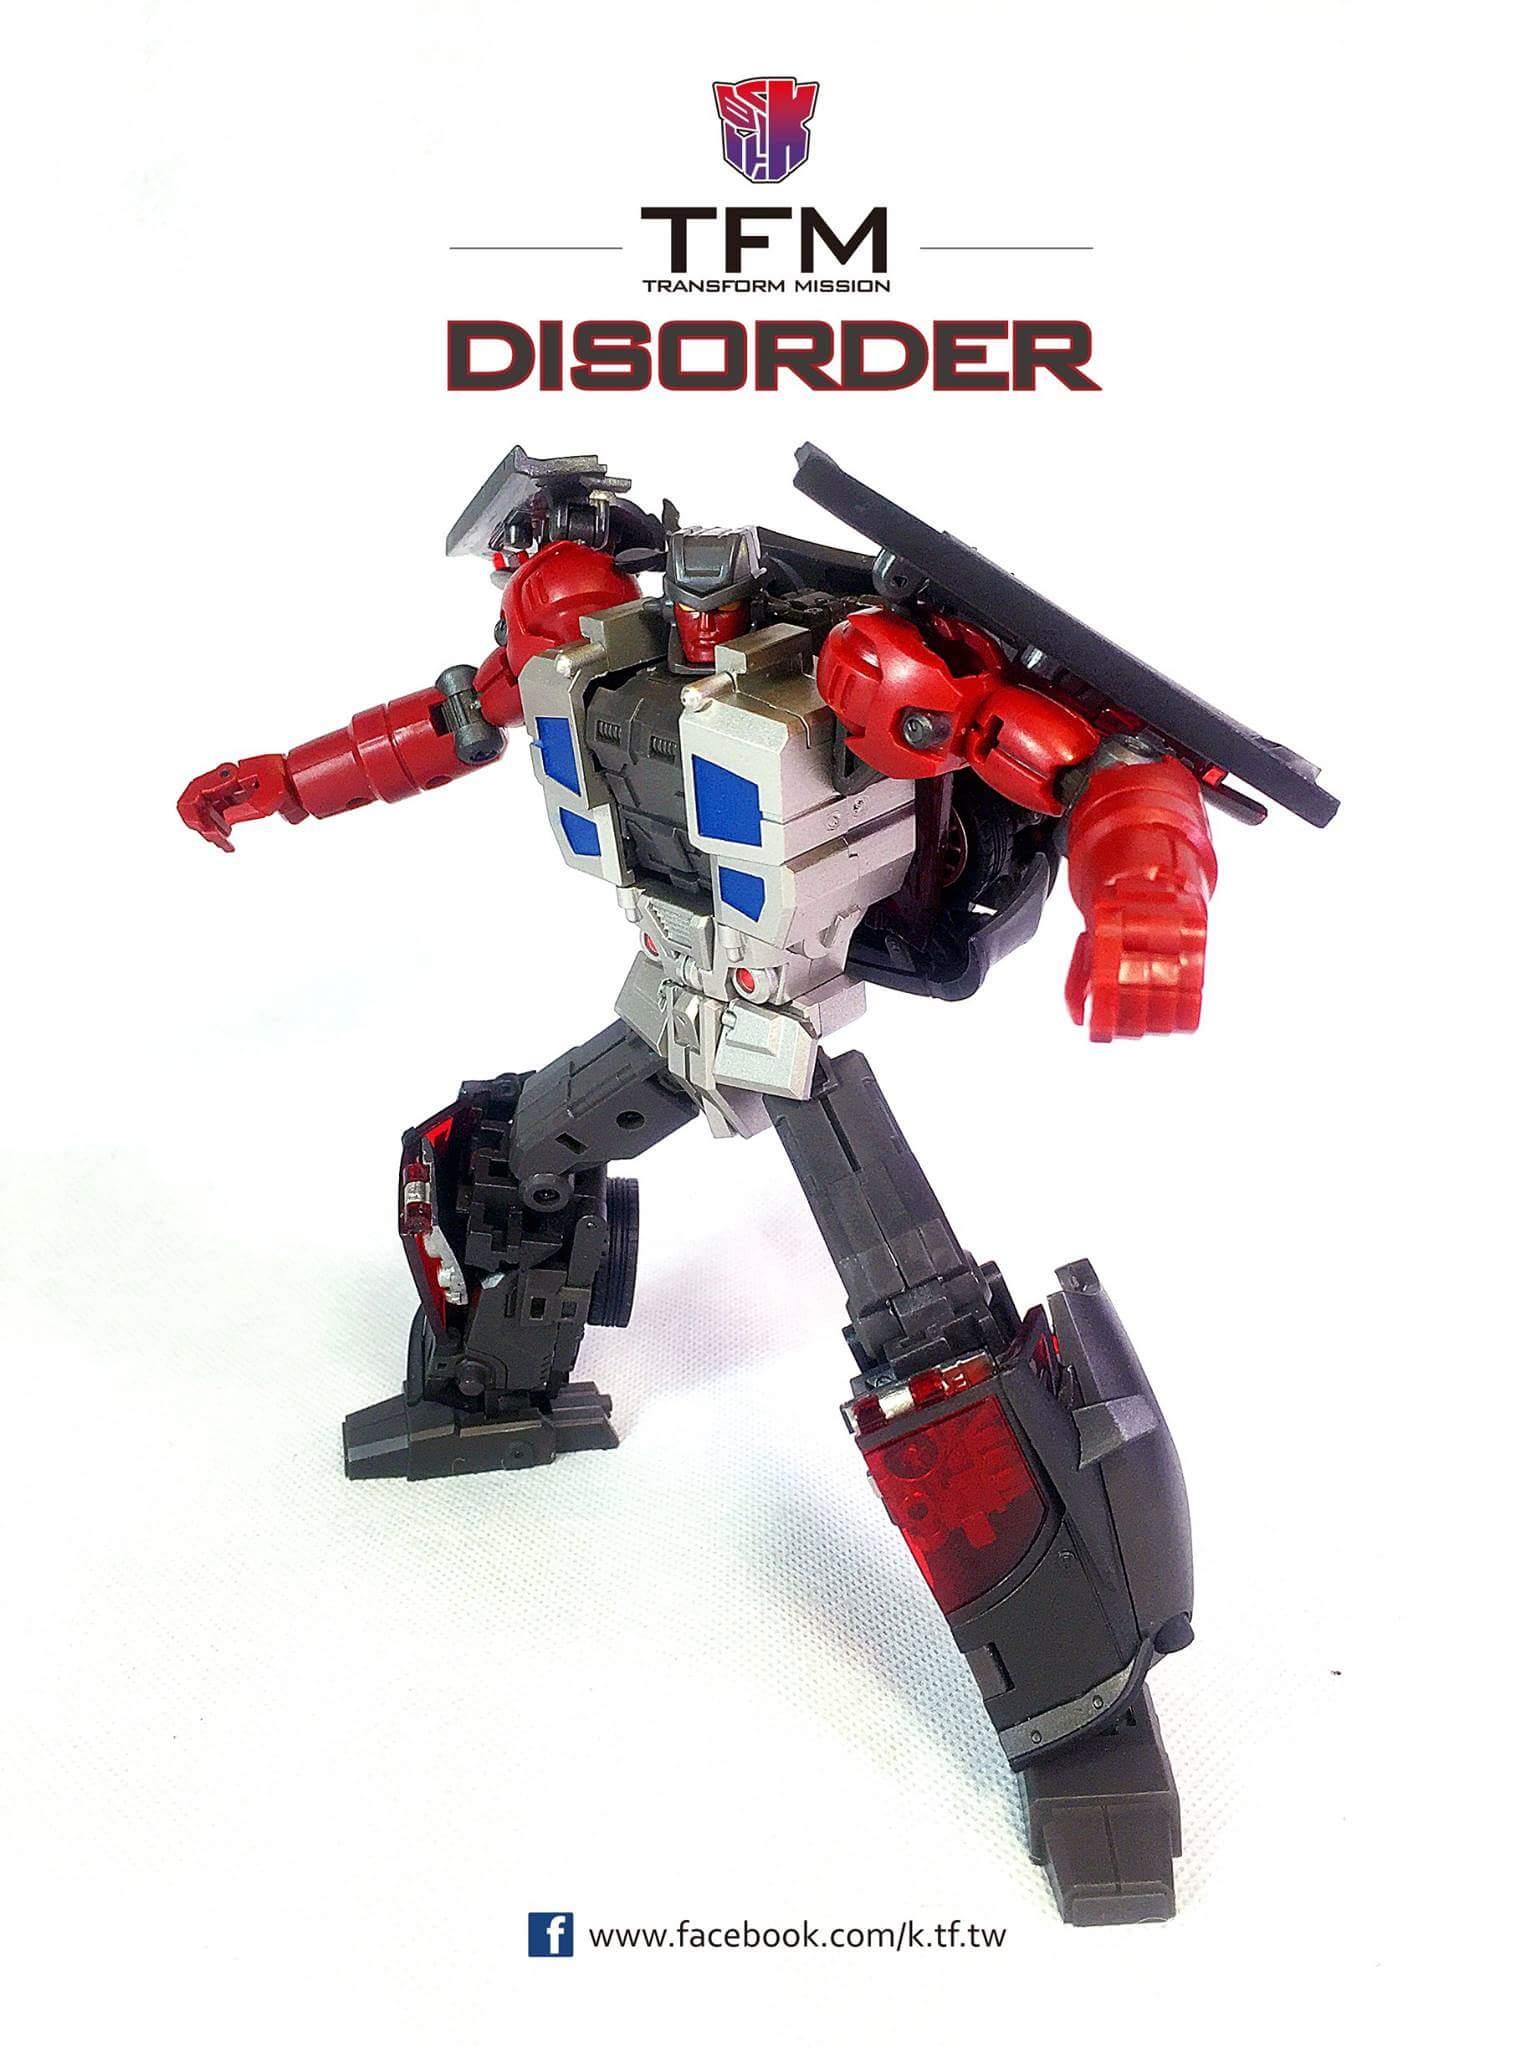 [Transform Mission] Produit Tiers - Jouet M-01 AutoSamurai - aka Menasor/Menaseur des BD IDW - Page 3 RhL6gBsg